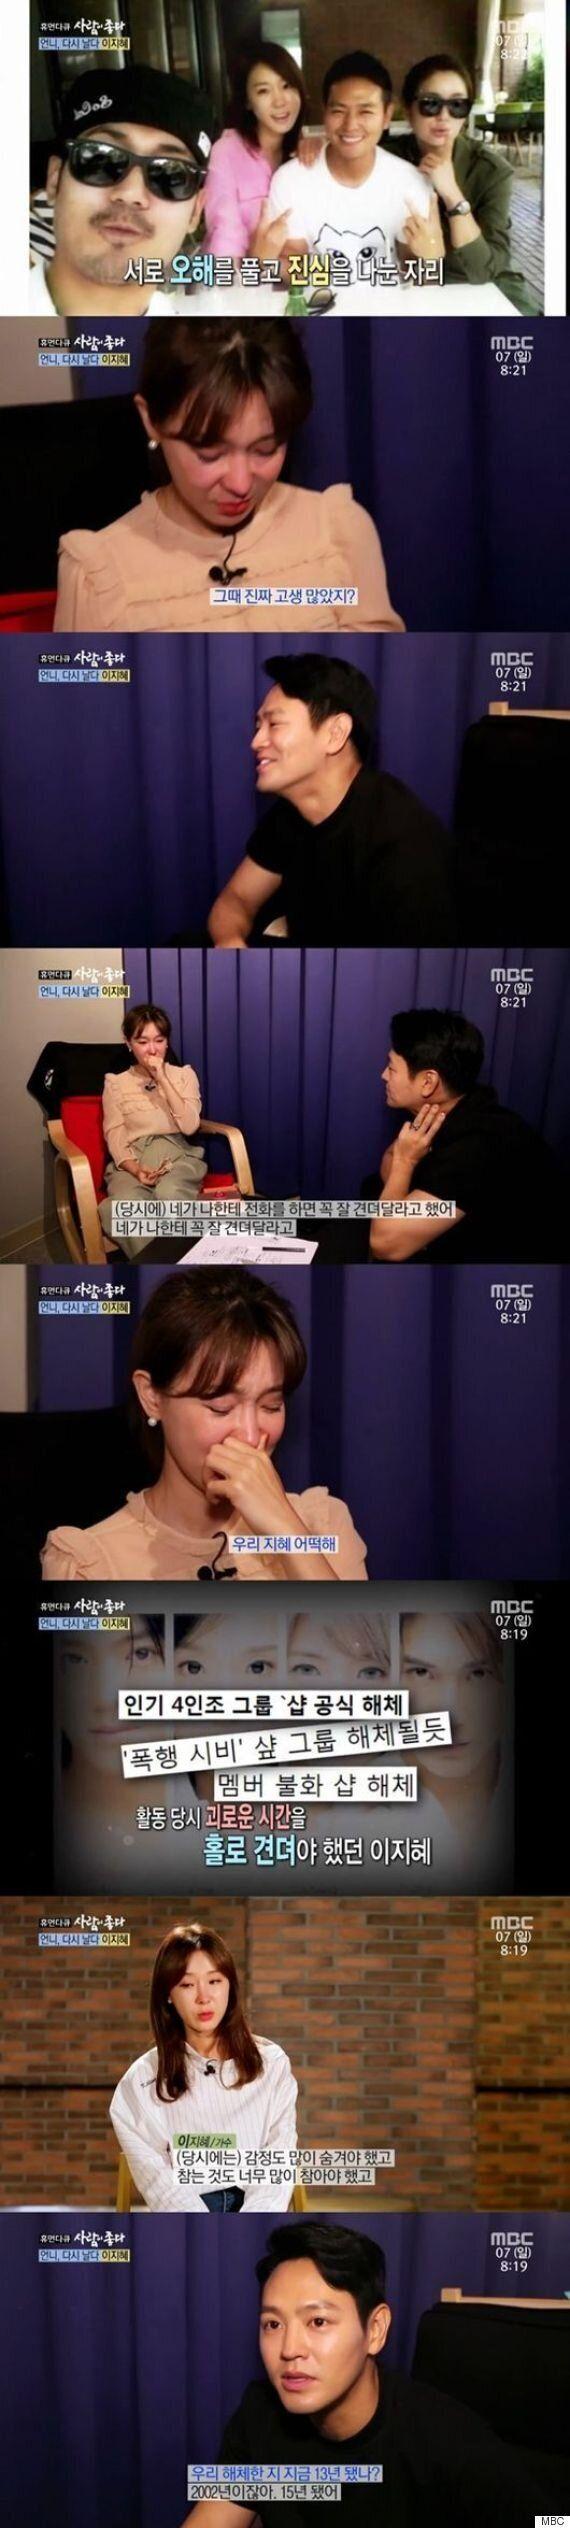 [Oh!쎈 리뷰] 불화부터 화해까지...'사람' 이지혜가 밝힌 그룹